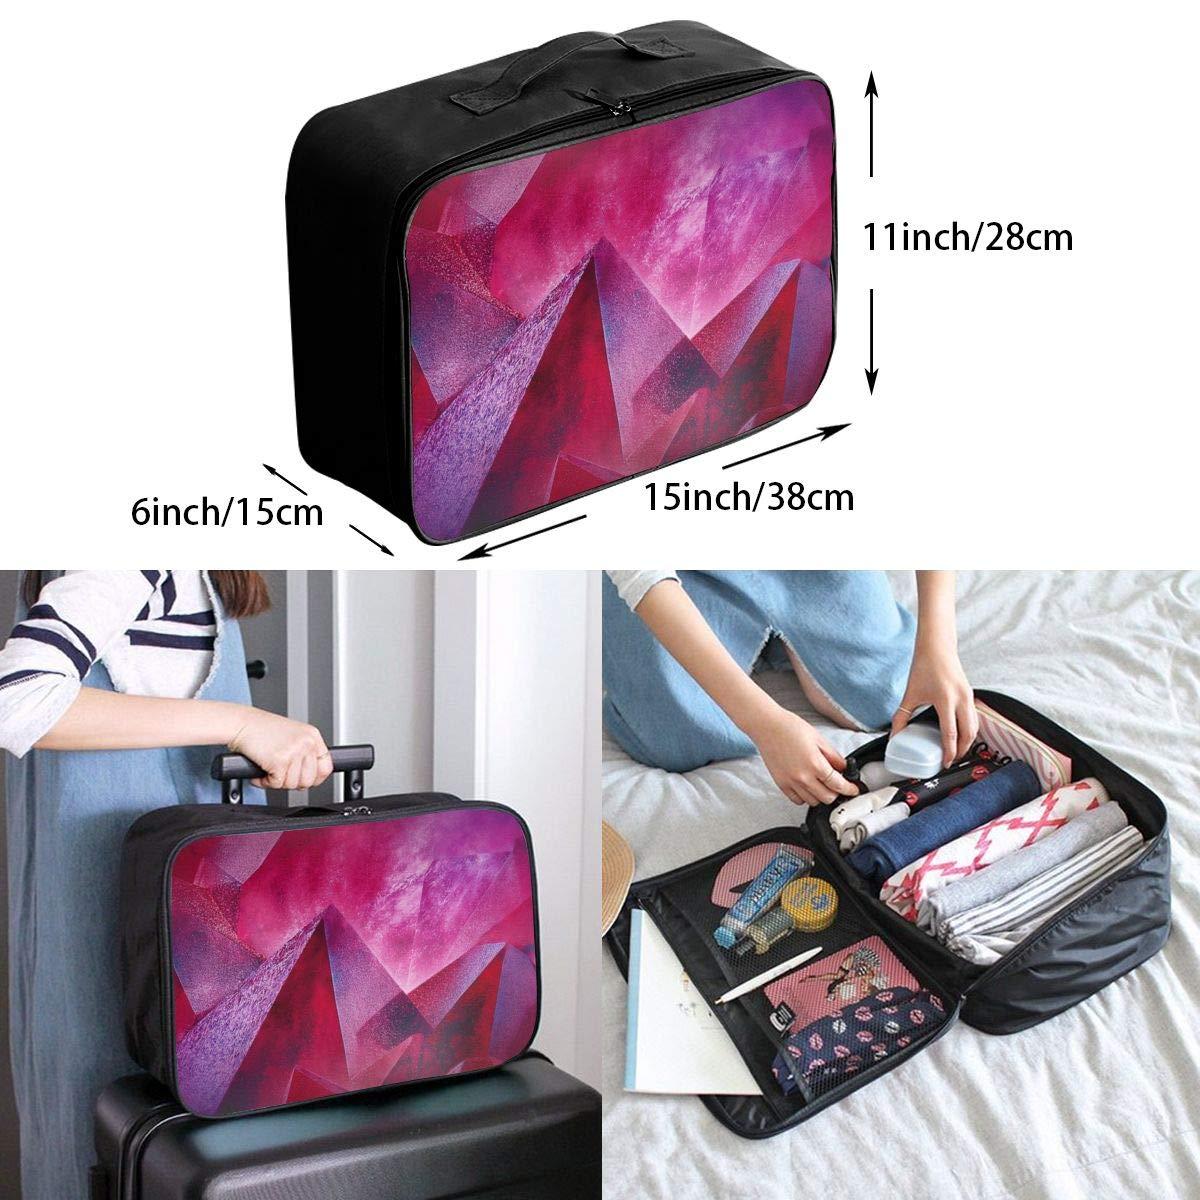 Travel Luggage Duffle Bag Lightweight Portable Handbag Geometry 3D Mountains Print Large Capacity Waterproof Foldable Storage Tote